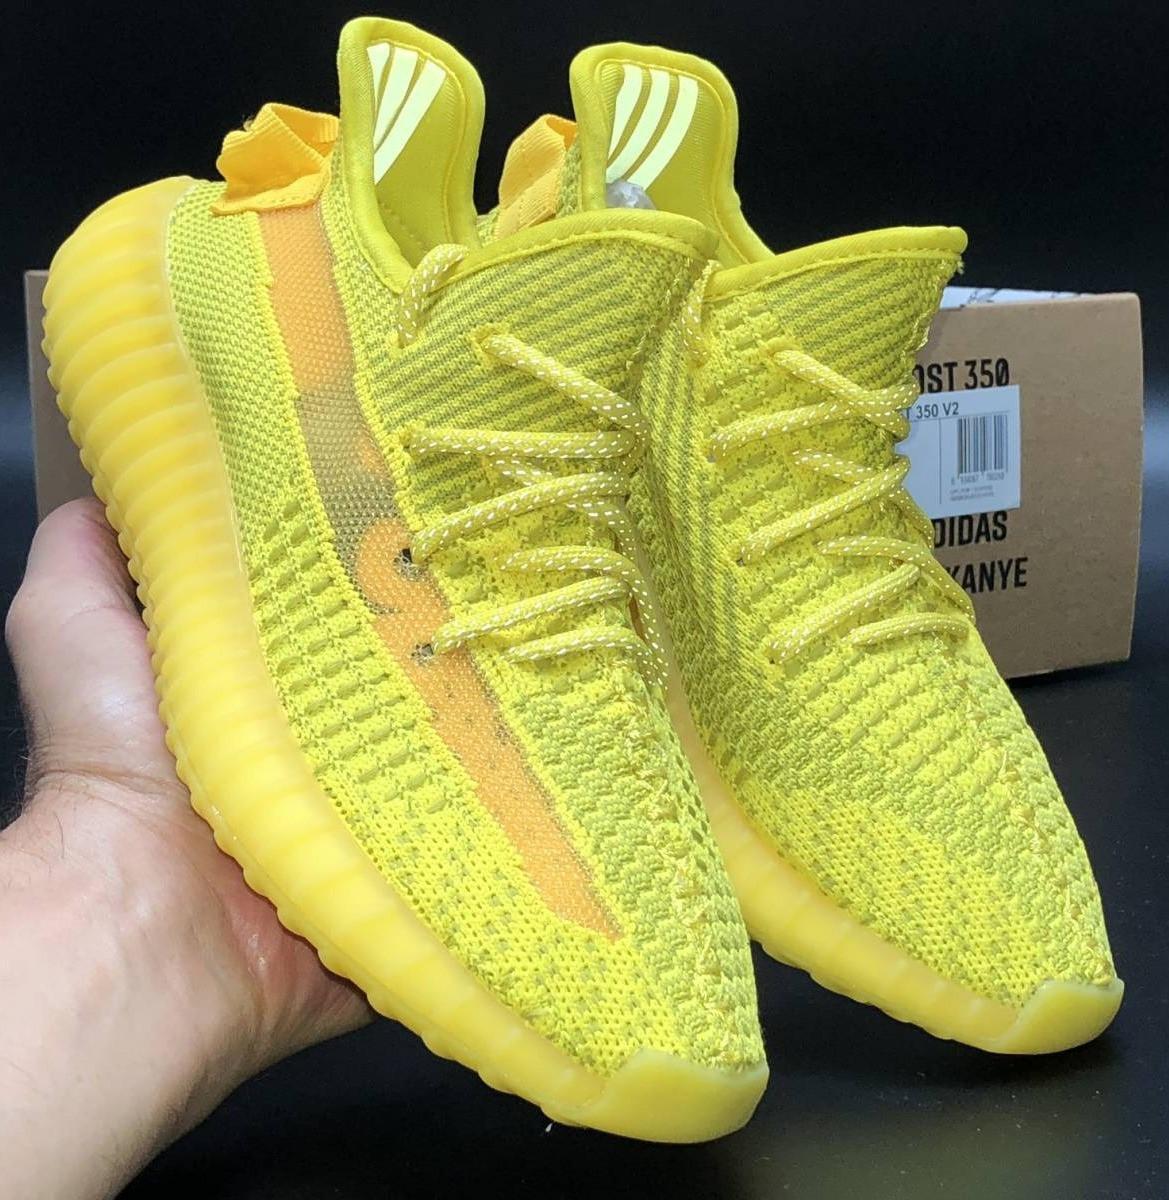 Мужские Кроссовки Adidas Yeezy Boost 350  Yellow (Рефлектив Шнурки)